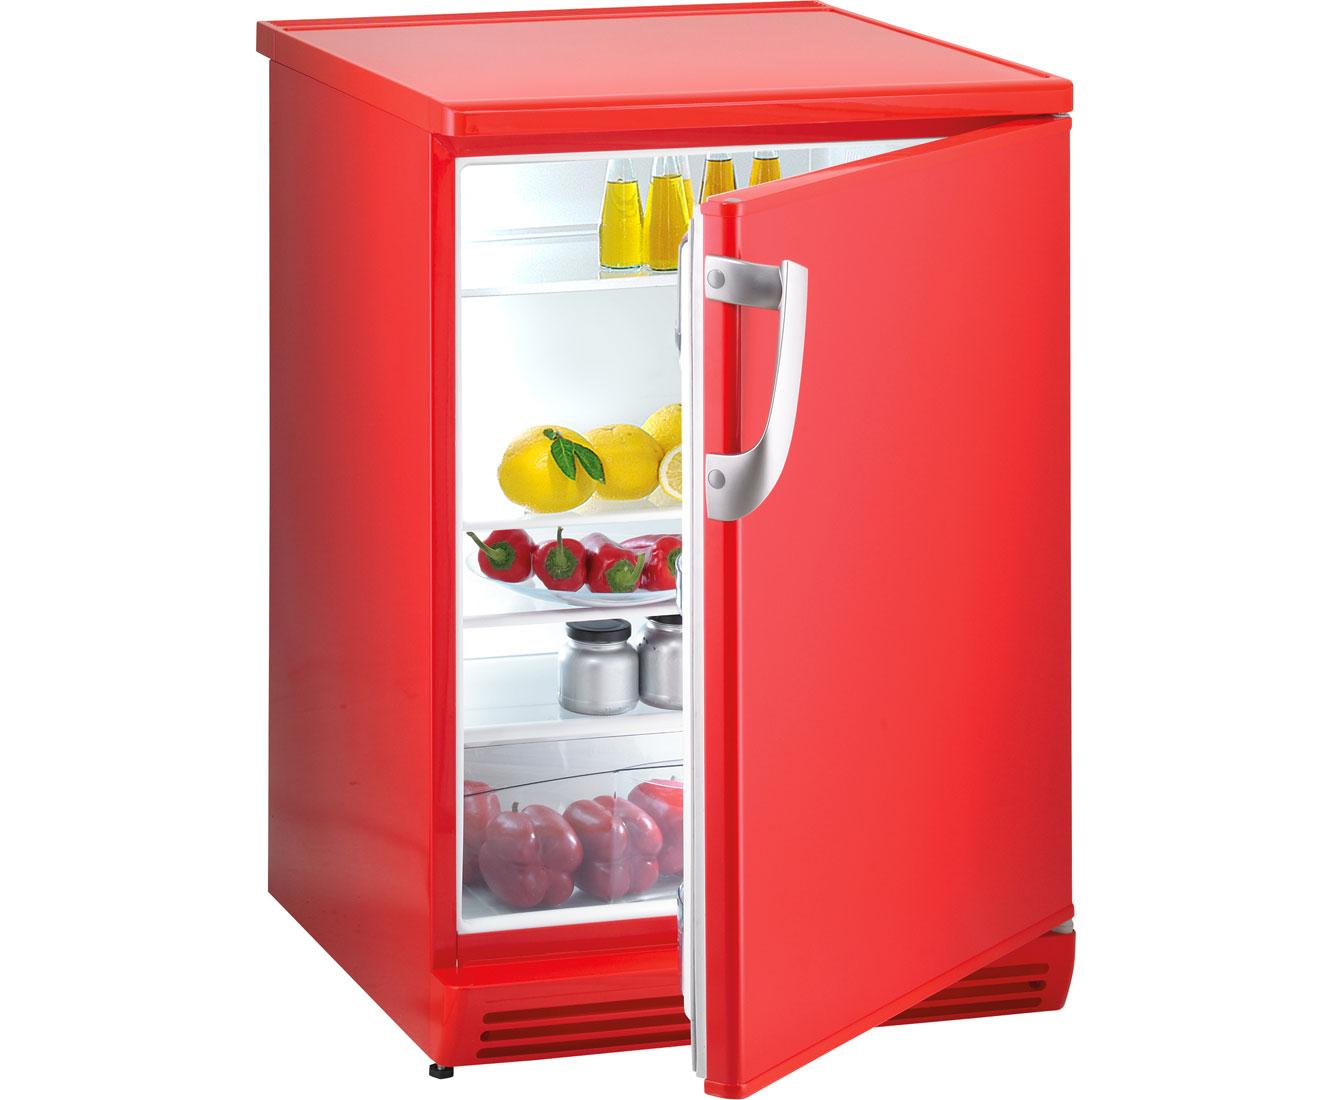 Aeg Unterbau Kühlschrank Dekorfähig : Unterbau kühlschrank mit gefrierfach gorgeous kühlschrank